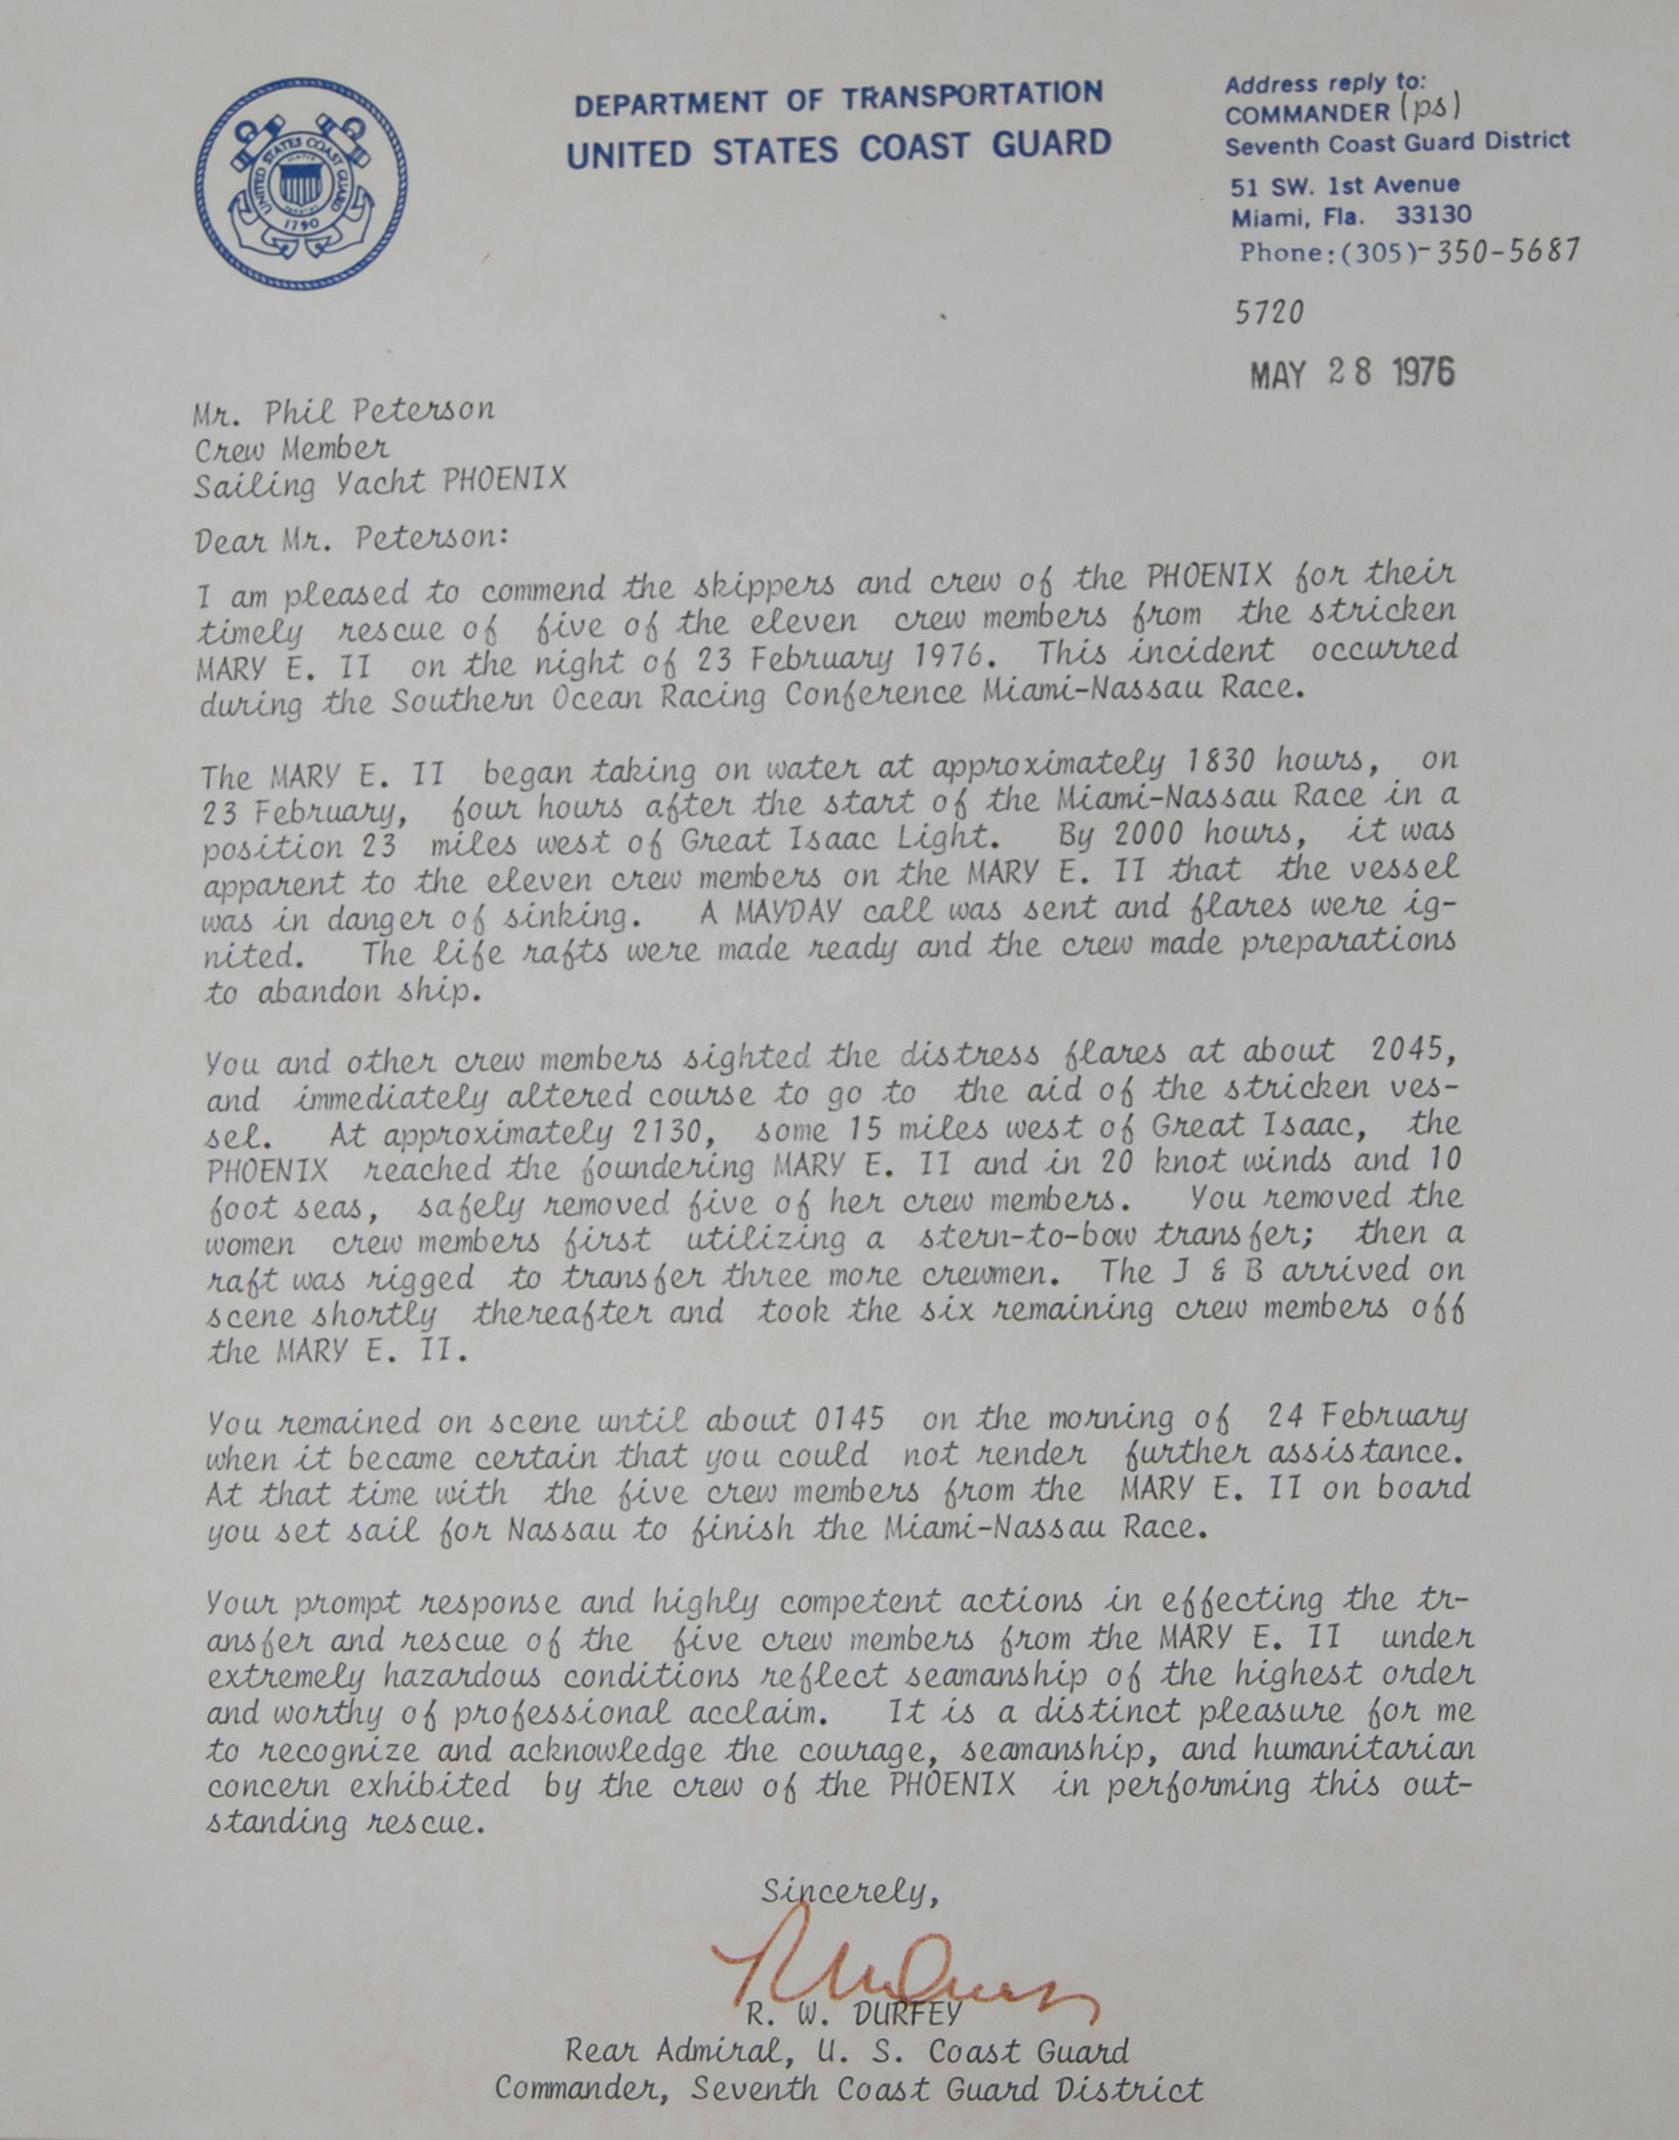 USCG Letter of Appreciation Pg 2 Letter 1976.jpg